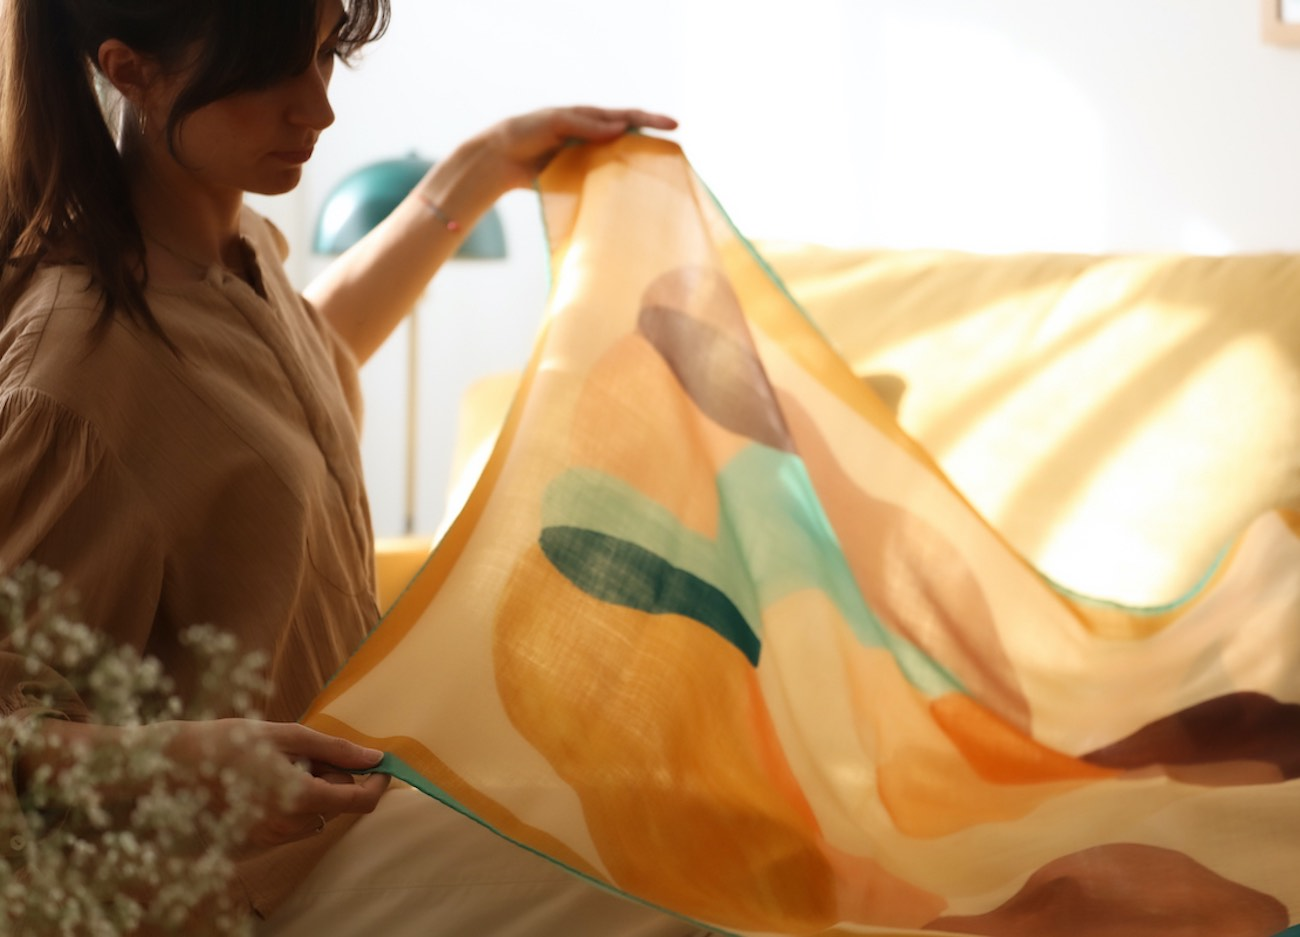 Pañuelo en seda italiana y lana Ingles. Almudena Laborda